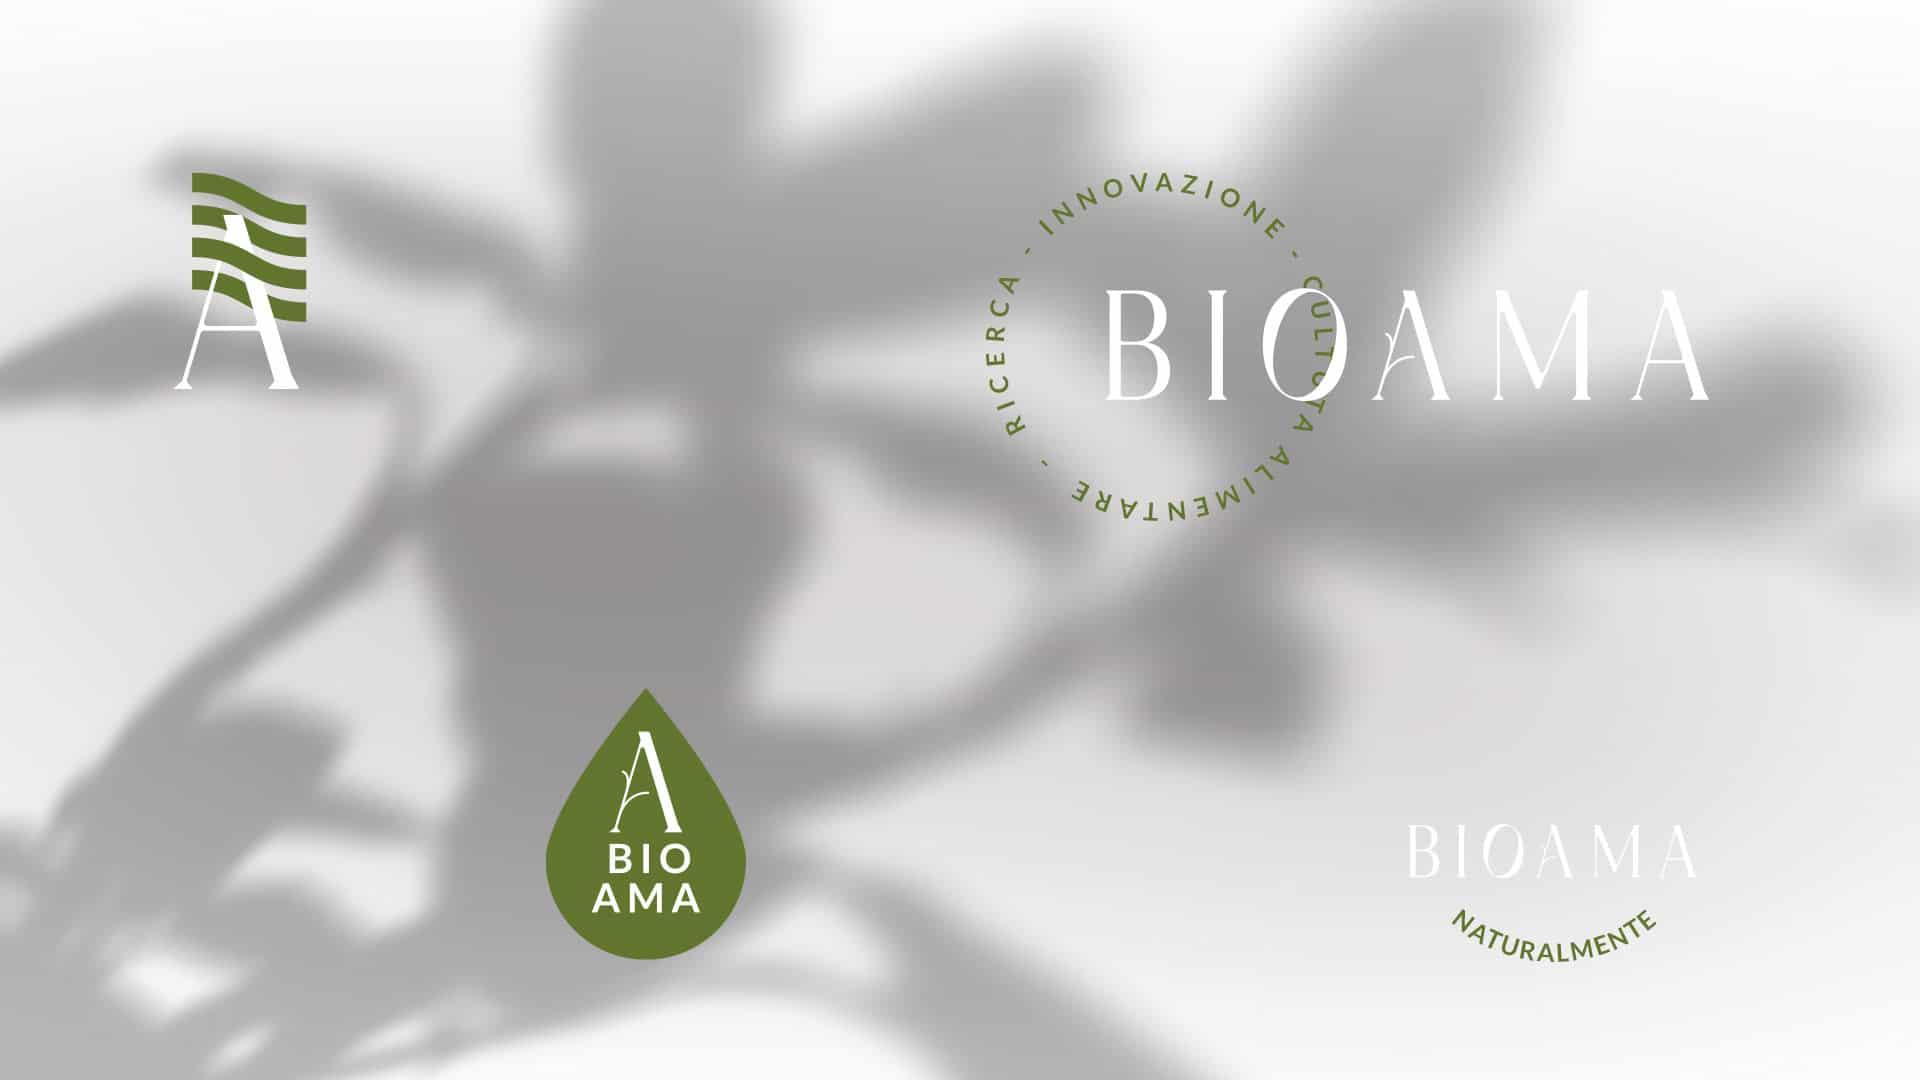 06 bioama logo declination grafico milano image